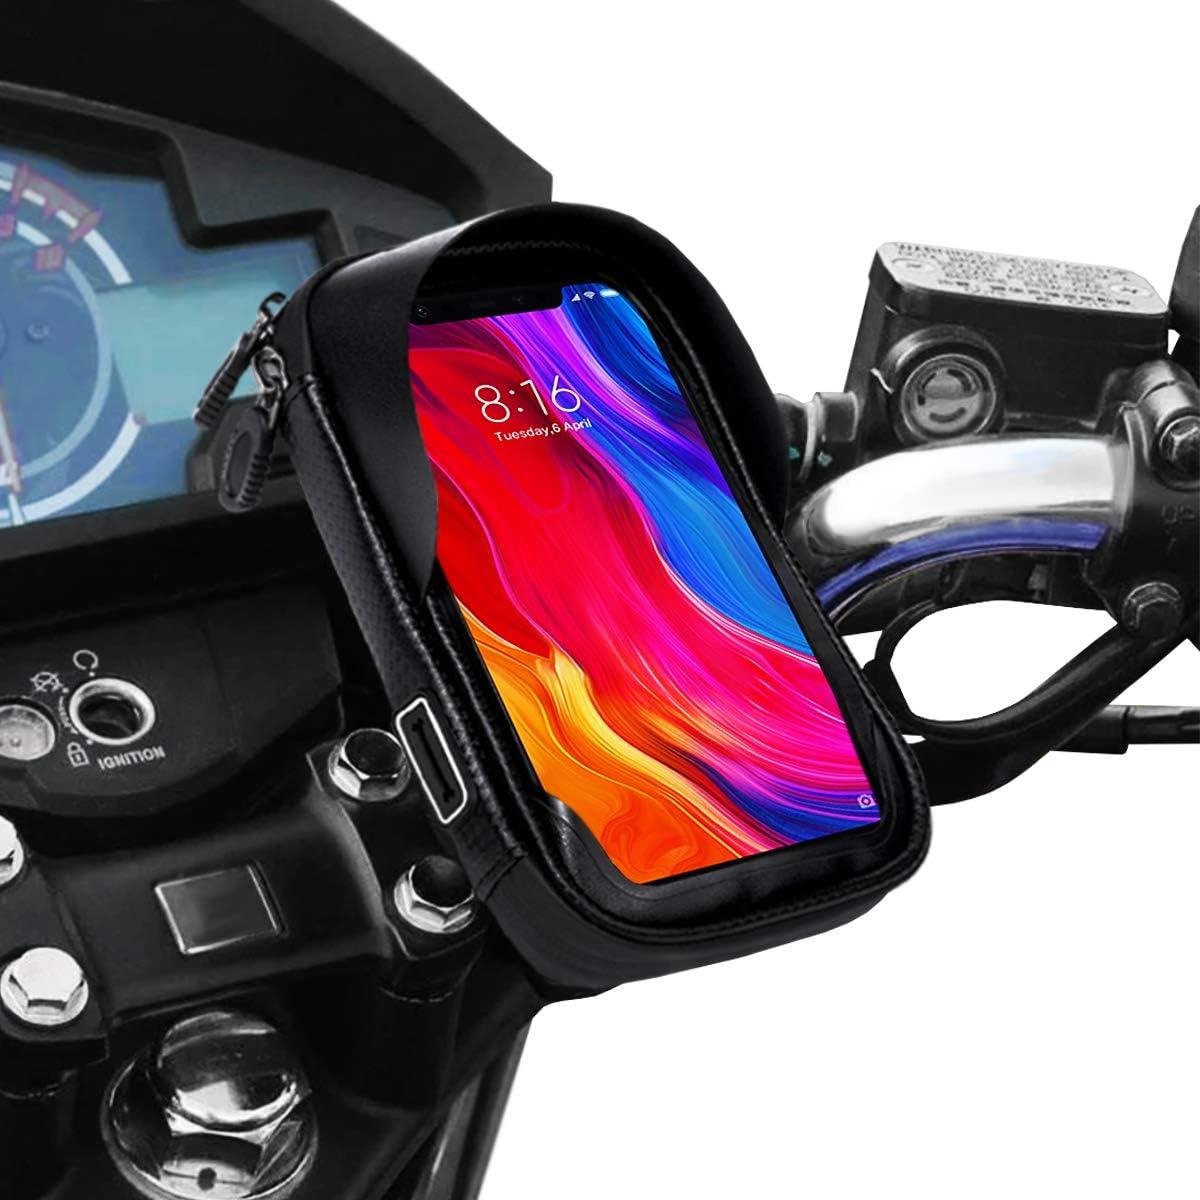 Soporte movil moto impermeable con cargador rapido telefono movil funda impermeable compatible con smartphones de hasta 6.9